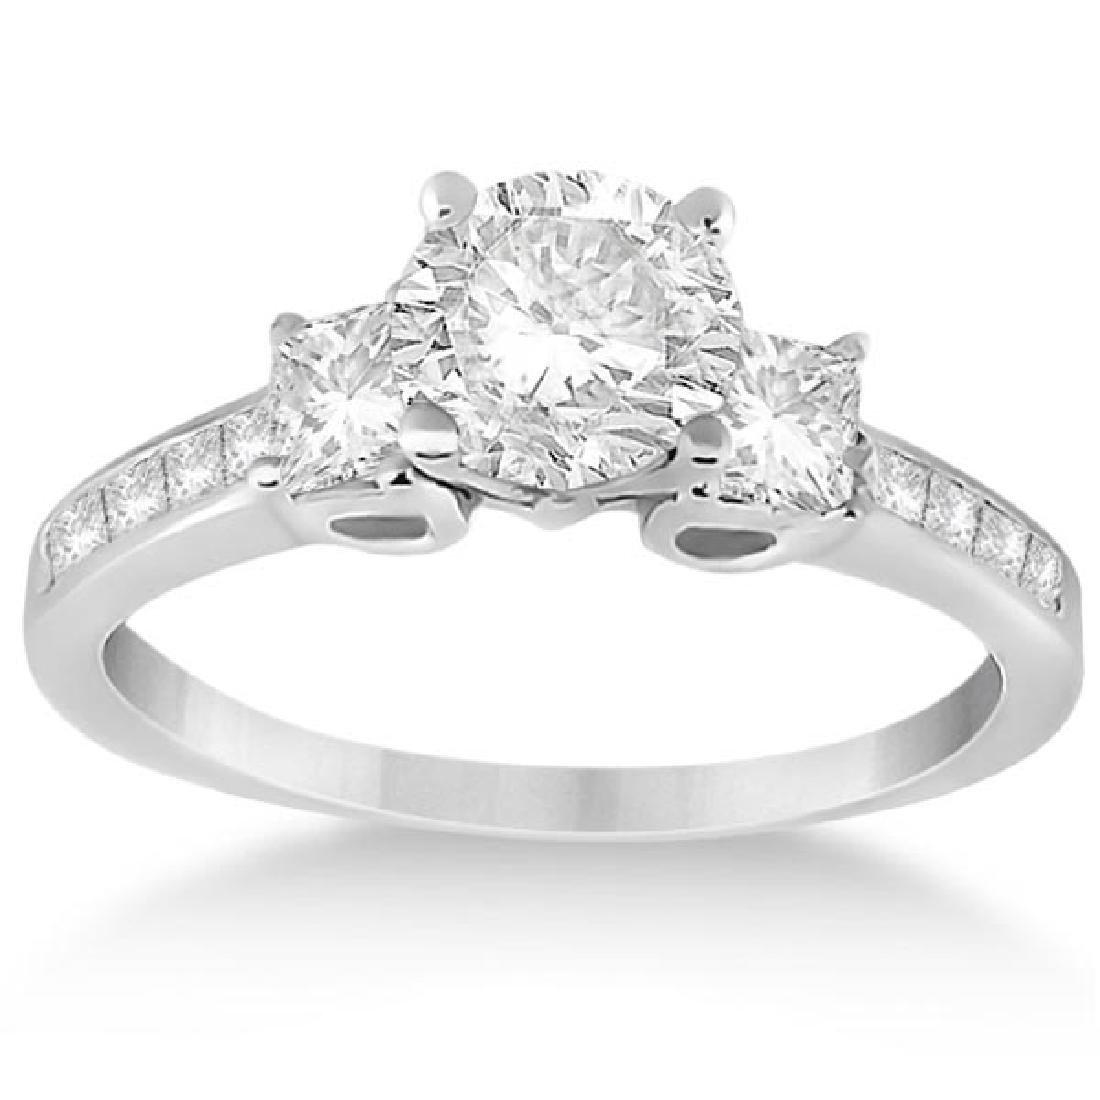 Three-Stone Princess Cut Diamond Engagement Ring 14k Wh